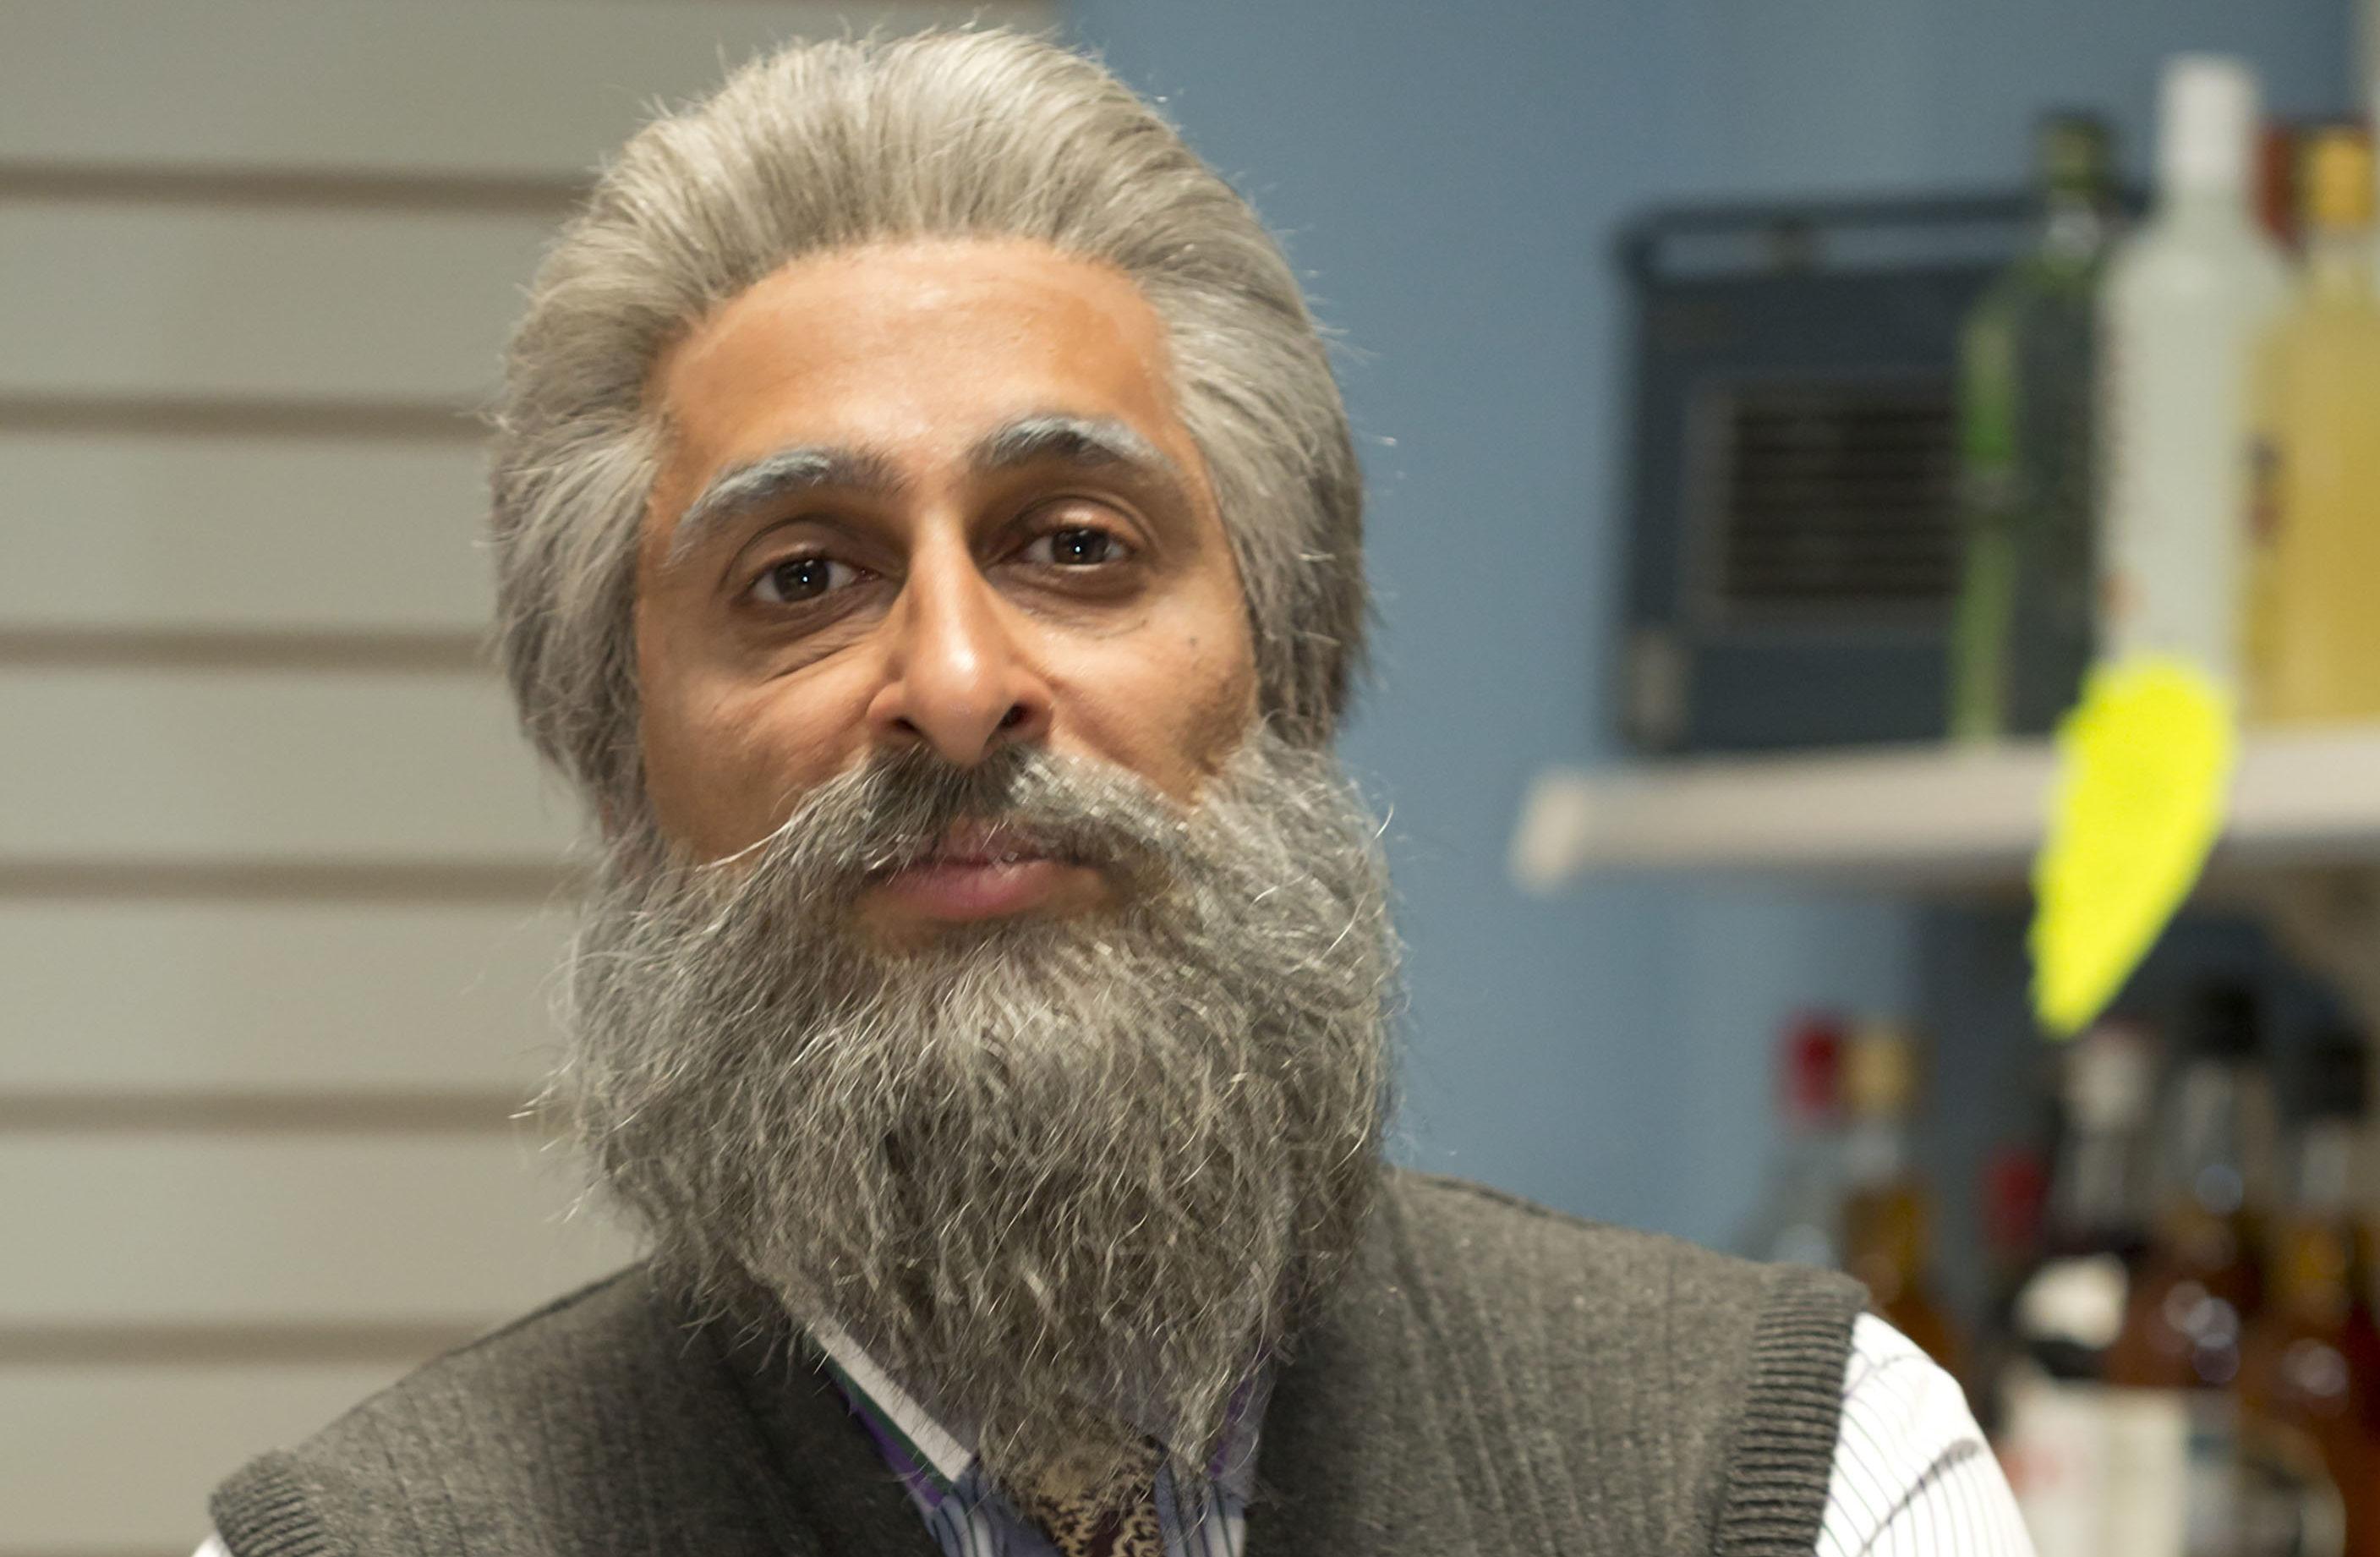 Sanjeev Kohli as Meena's husband Navid (BBC)